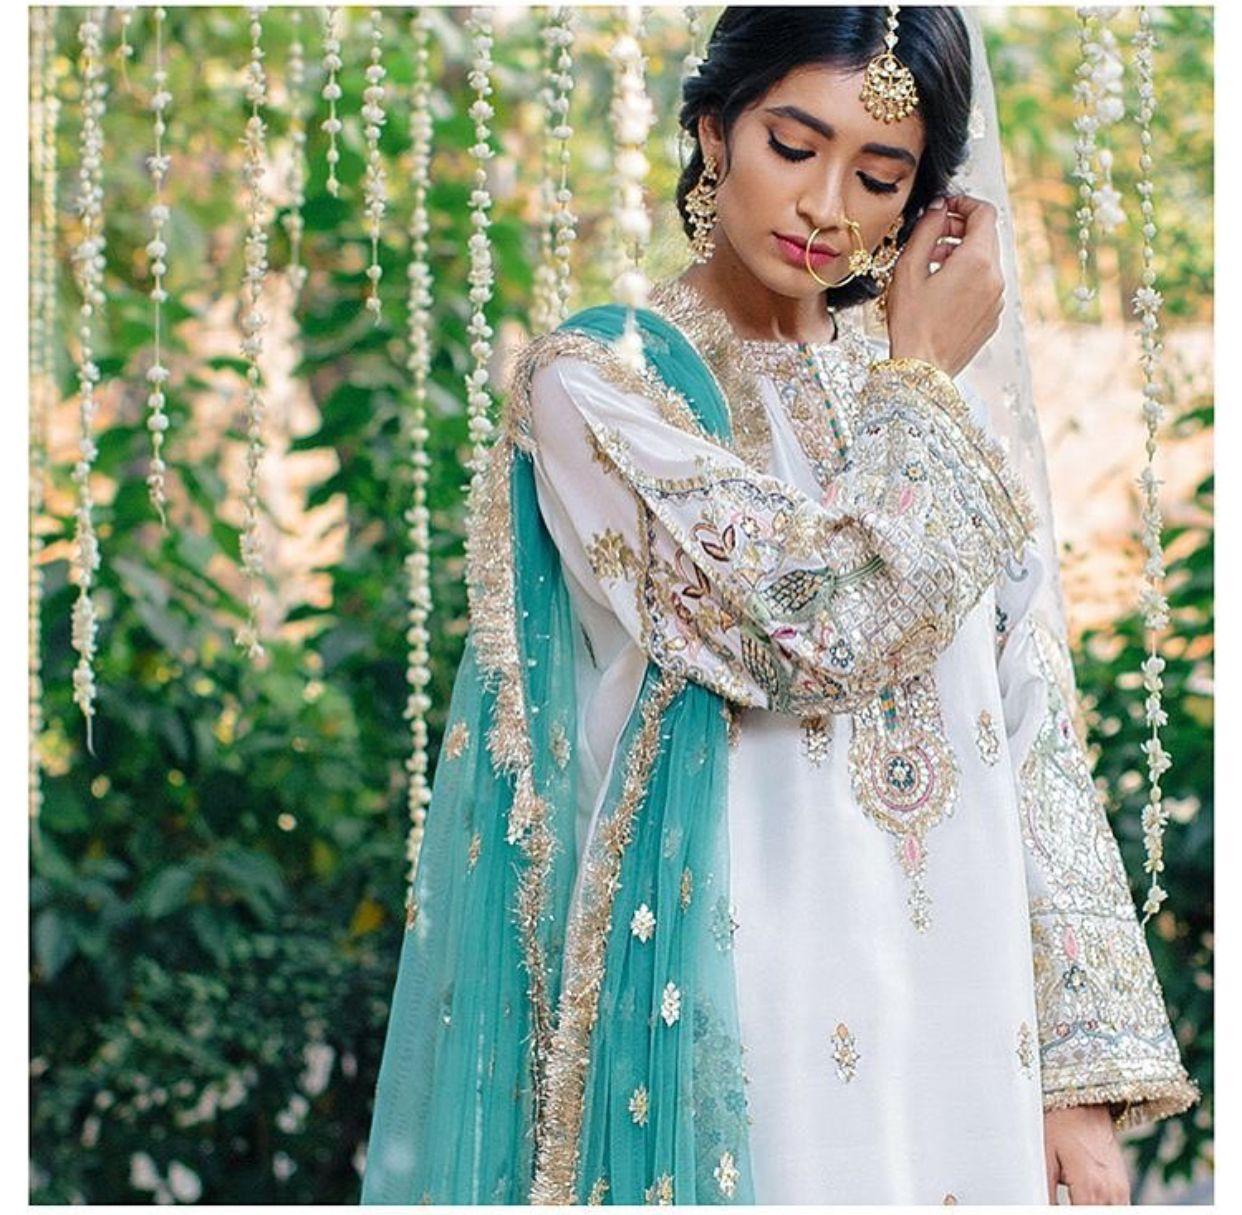 Sari wedding dress  Pin by Fatima Tremasi on Womenus Pakistani Wear  Pinterest  Asian